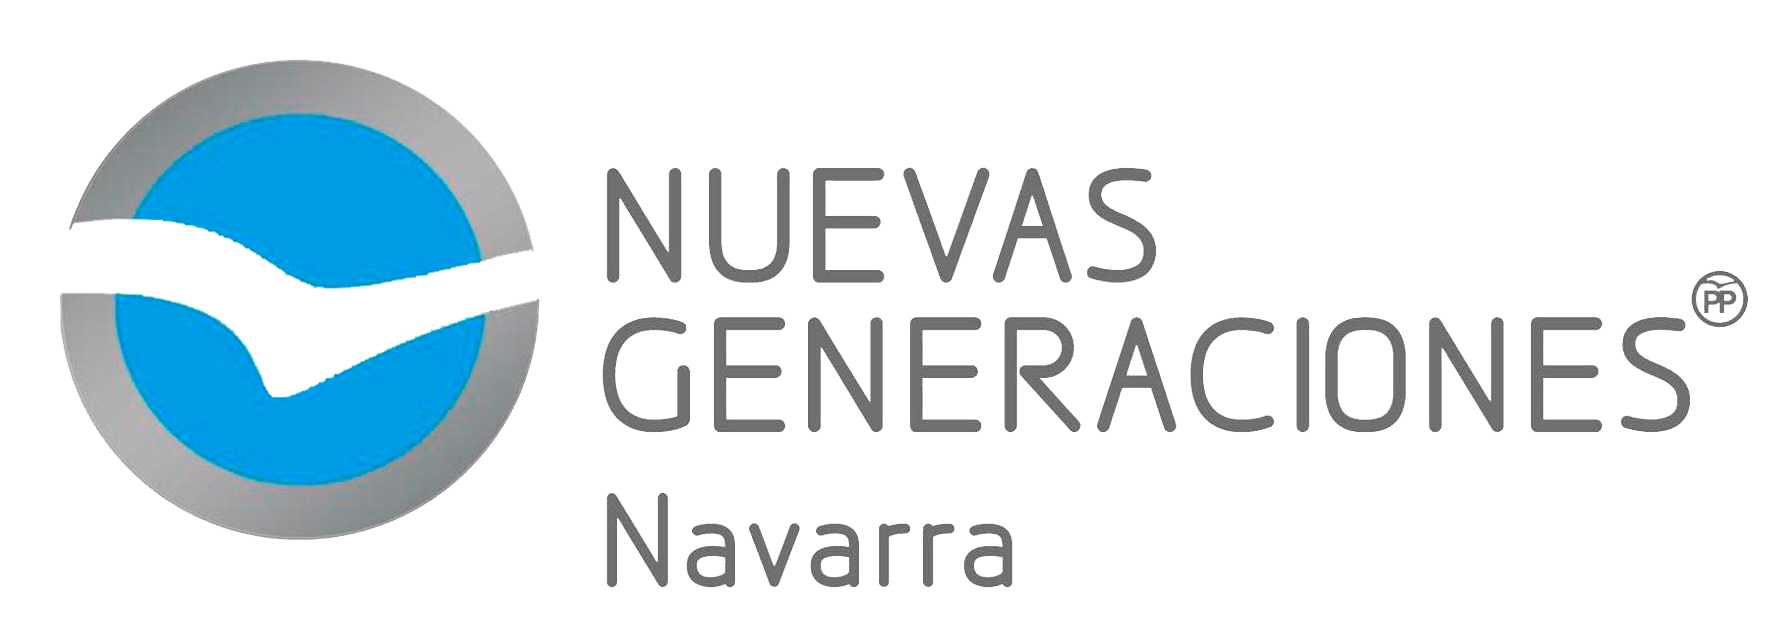 NN.GG Navarra